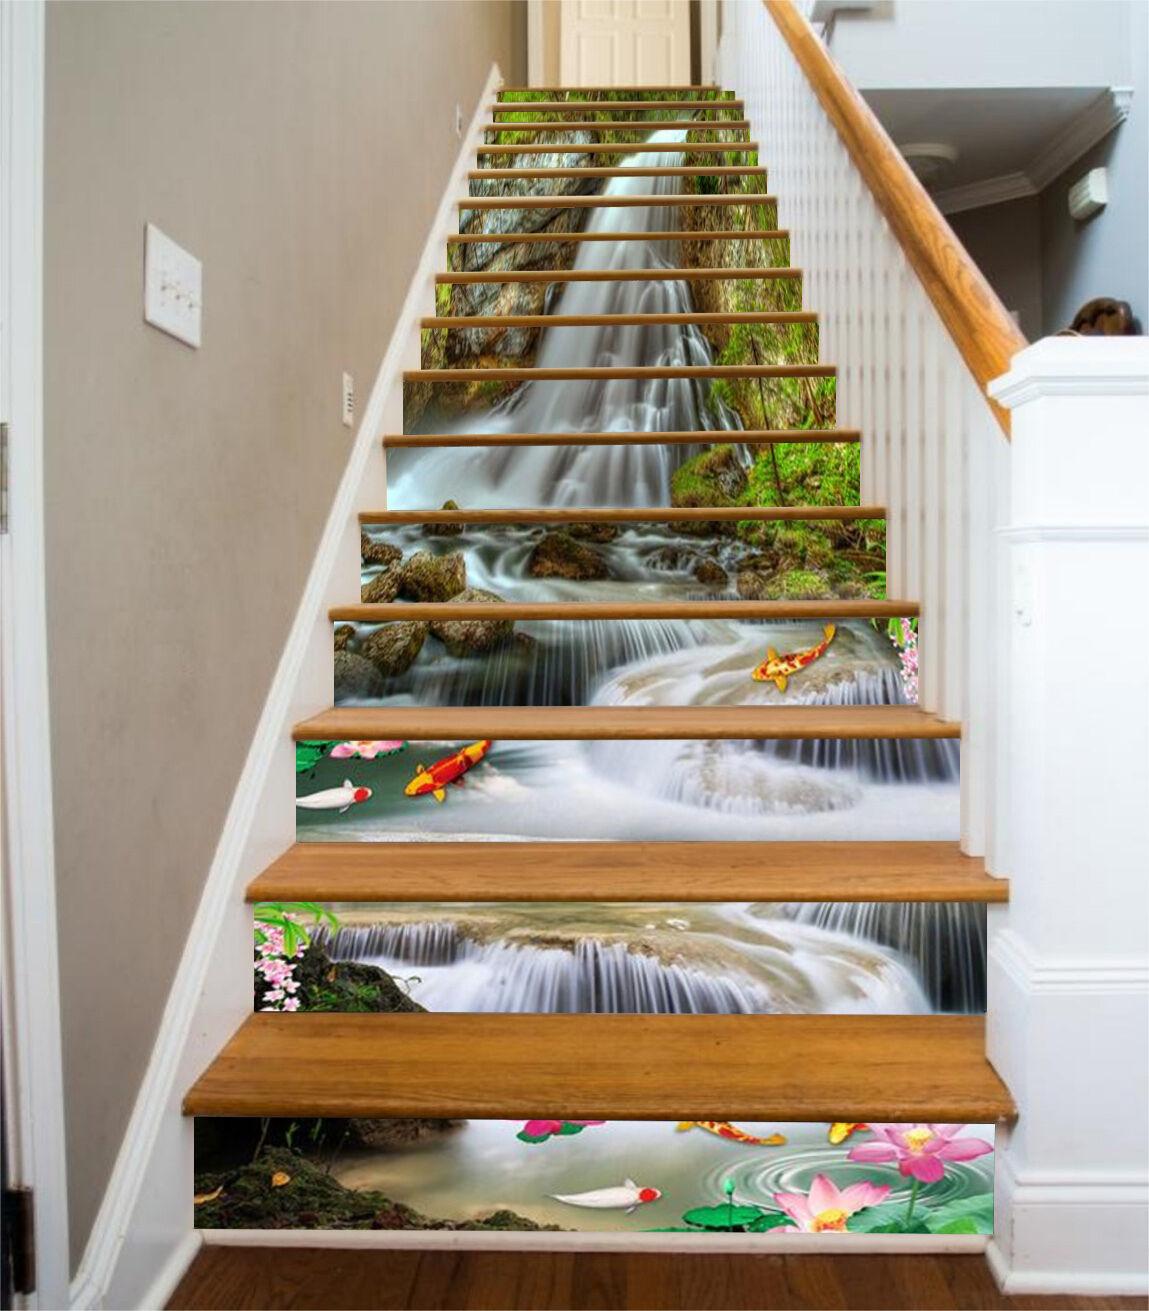 3D Pretty Falls 631 Stair Risers Decoration Photo Mural Vinyl Decal WandPapier UK